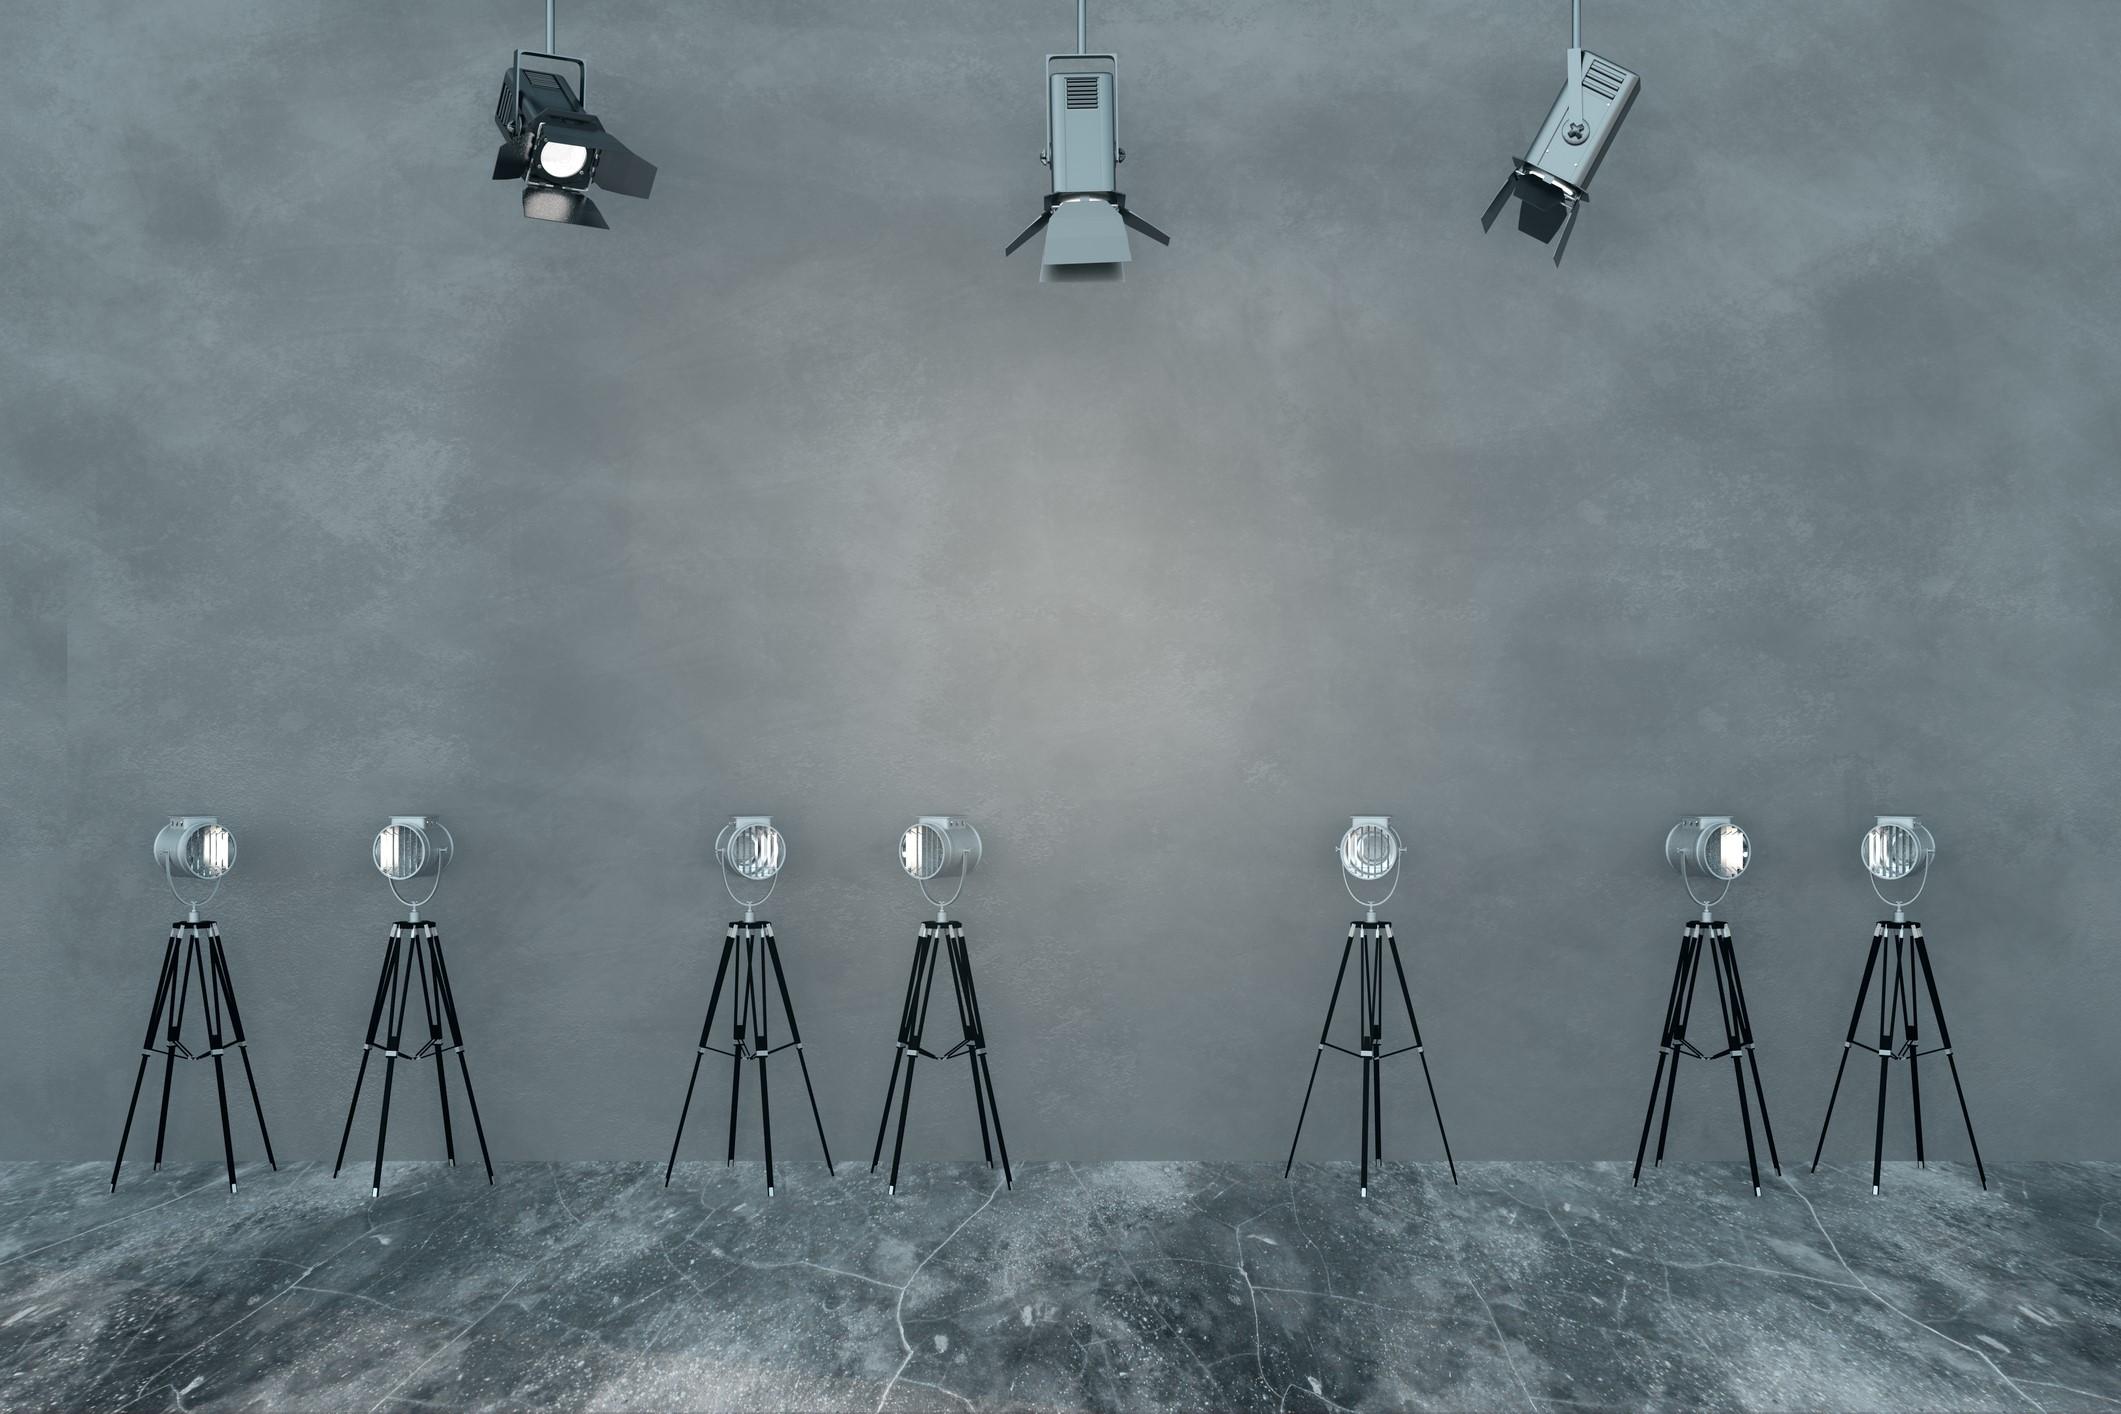 qwqw - The Fundamentals of Real Estate Photo Editing